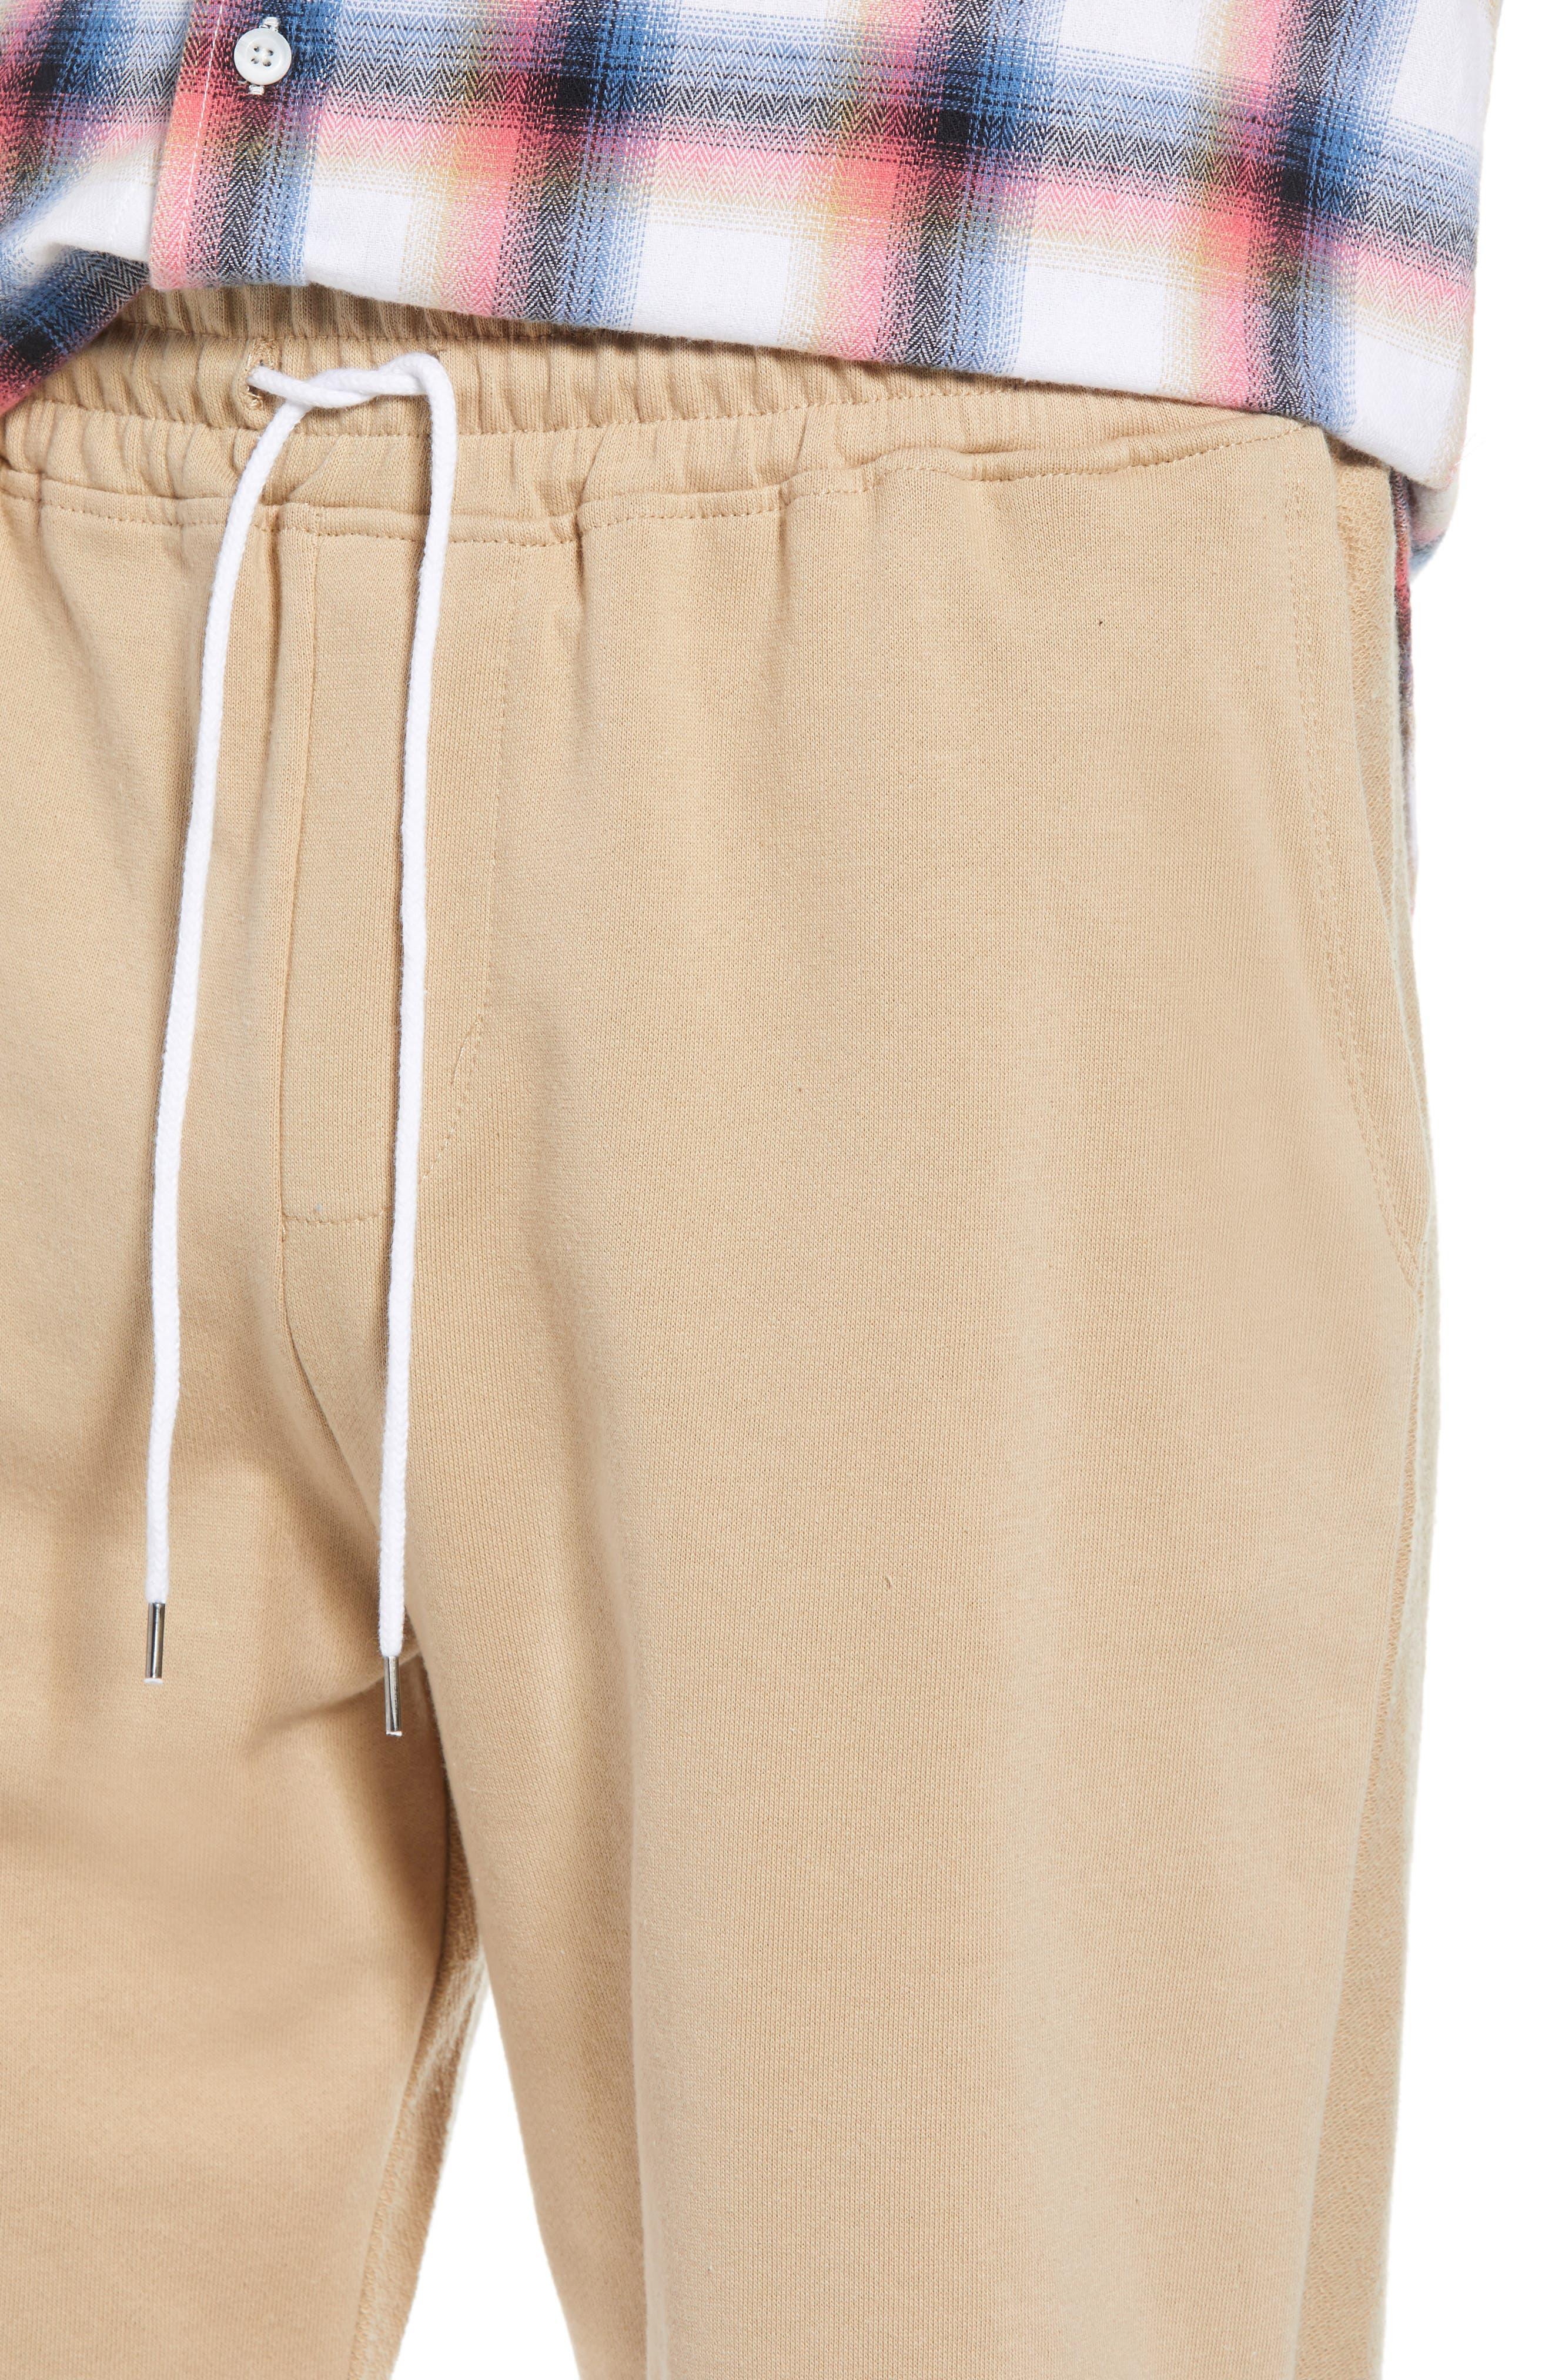 Terry Drawstring Shorts,                             Alternate thumbnail 4, color,                             235